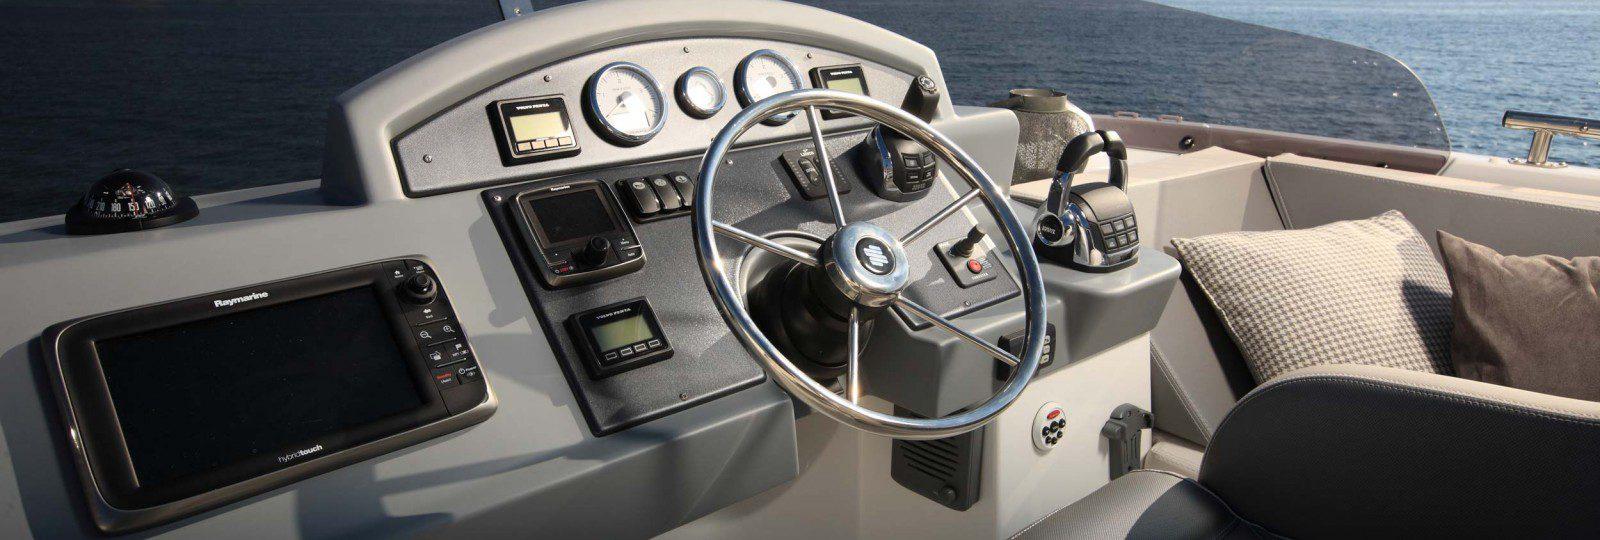 Beneteau Swift Trawler 50 flybridge helm